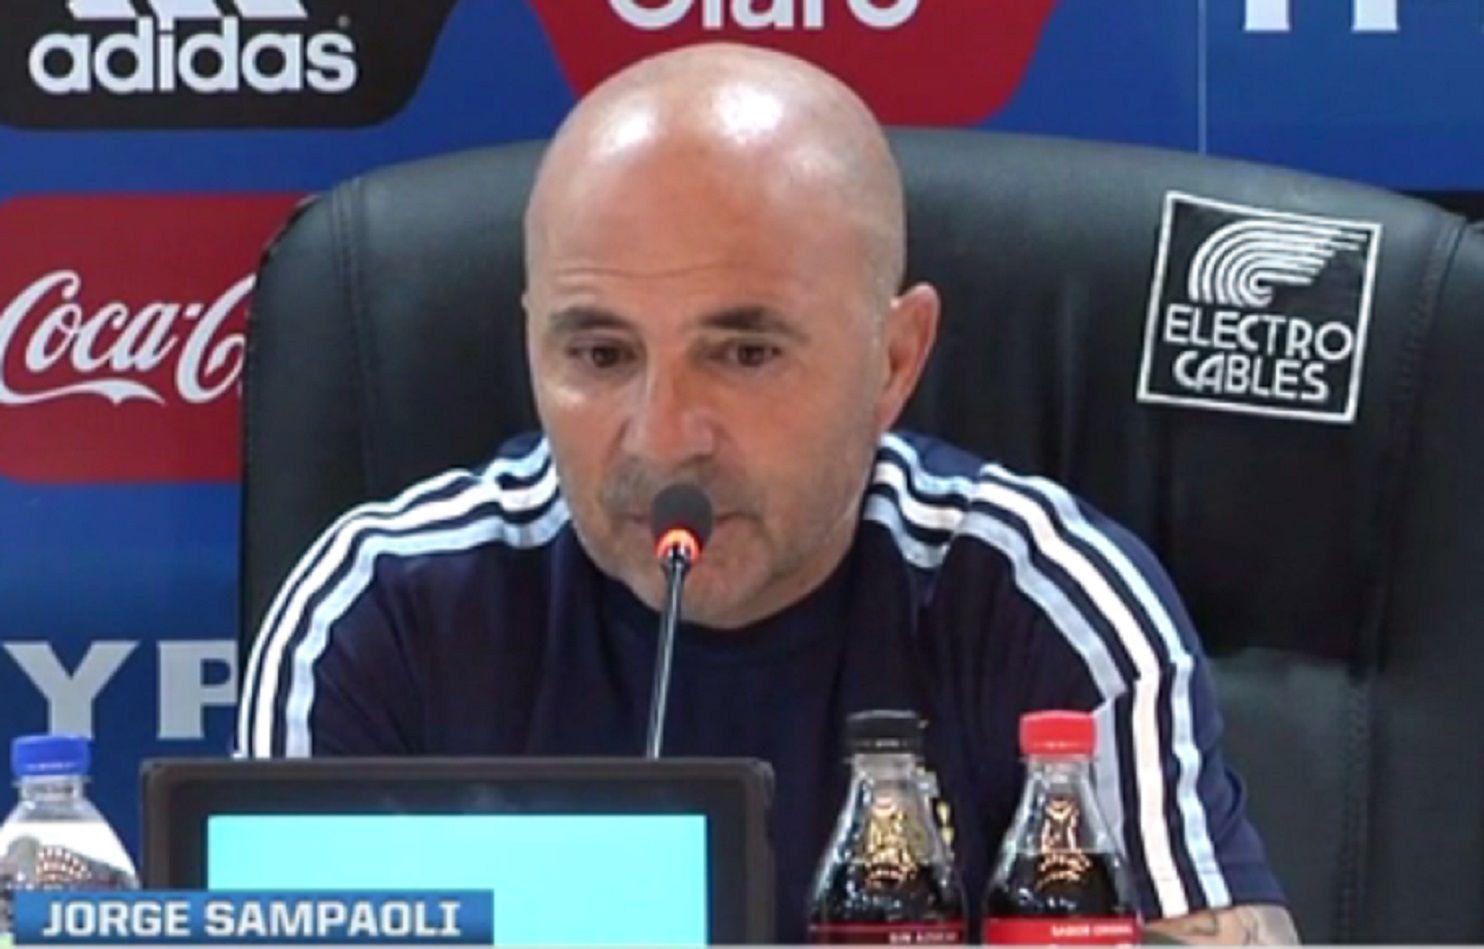 Messi, Cristiano Ronaldo y... el insólito tercer voto de Sampaoli